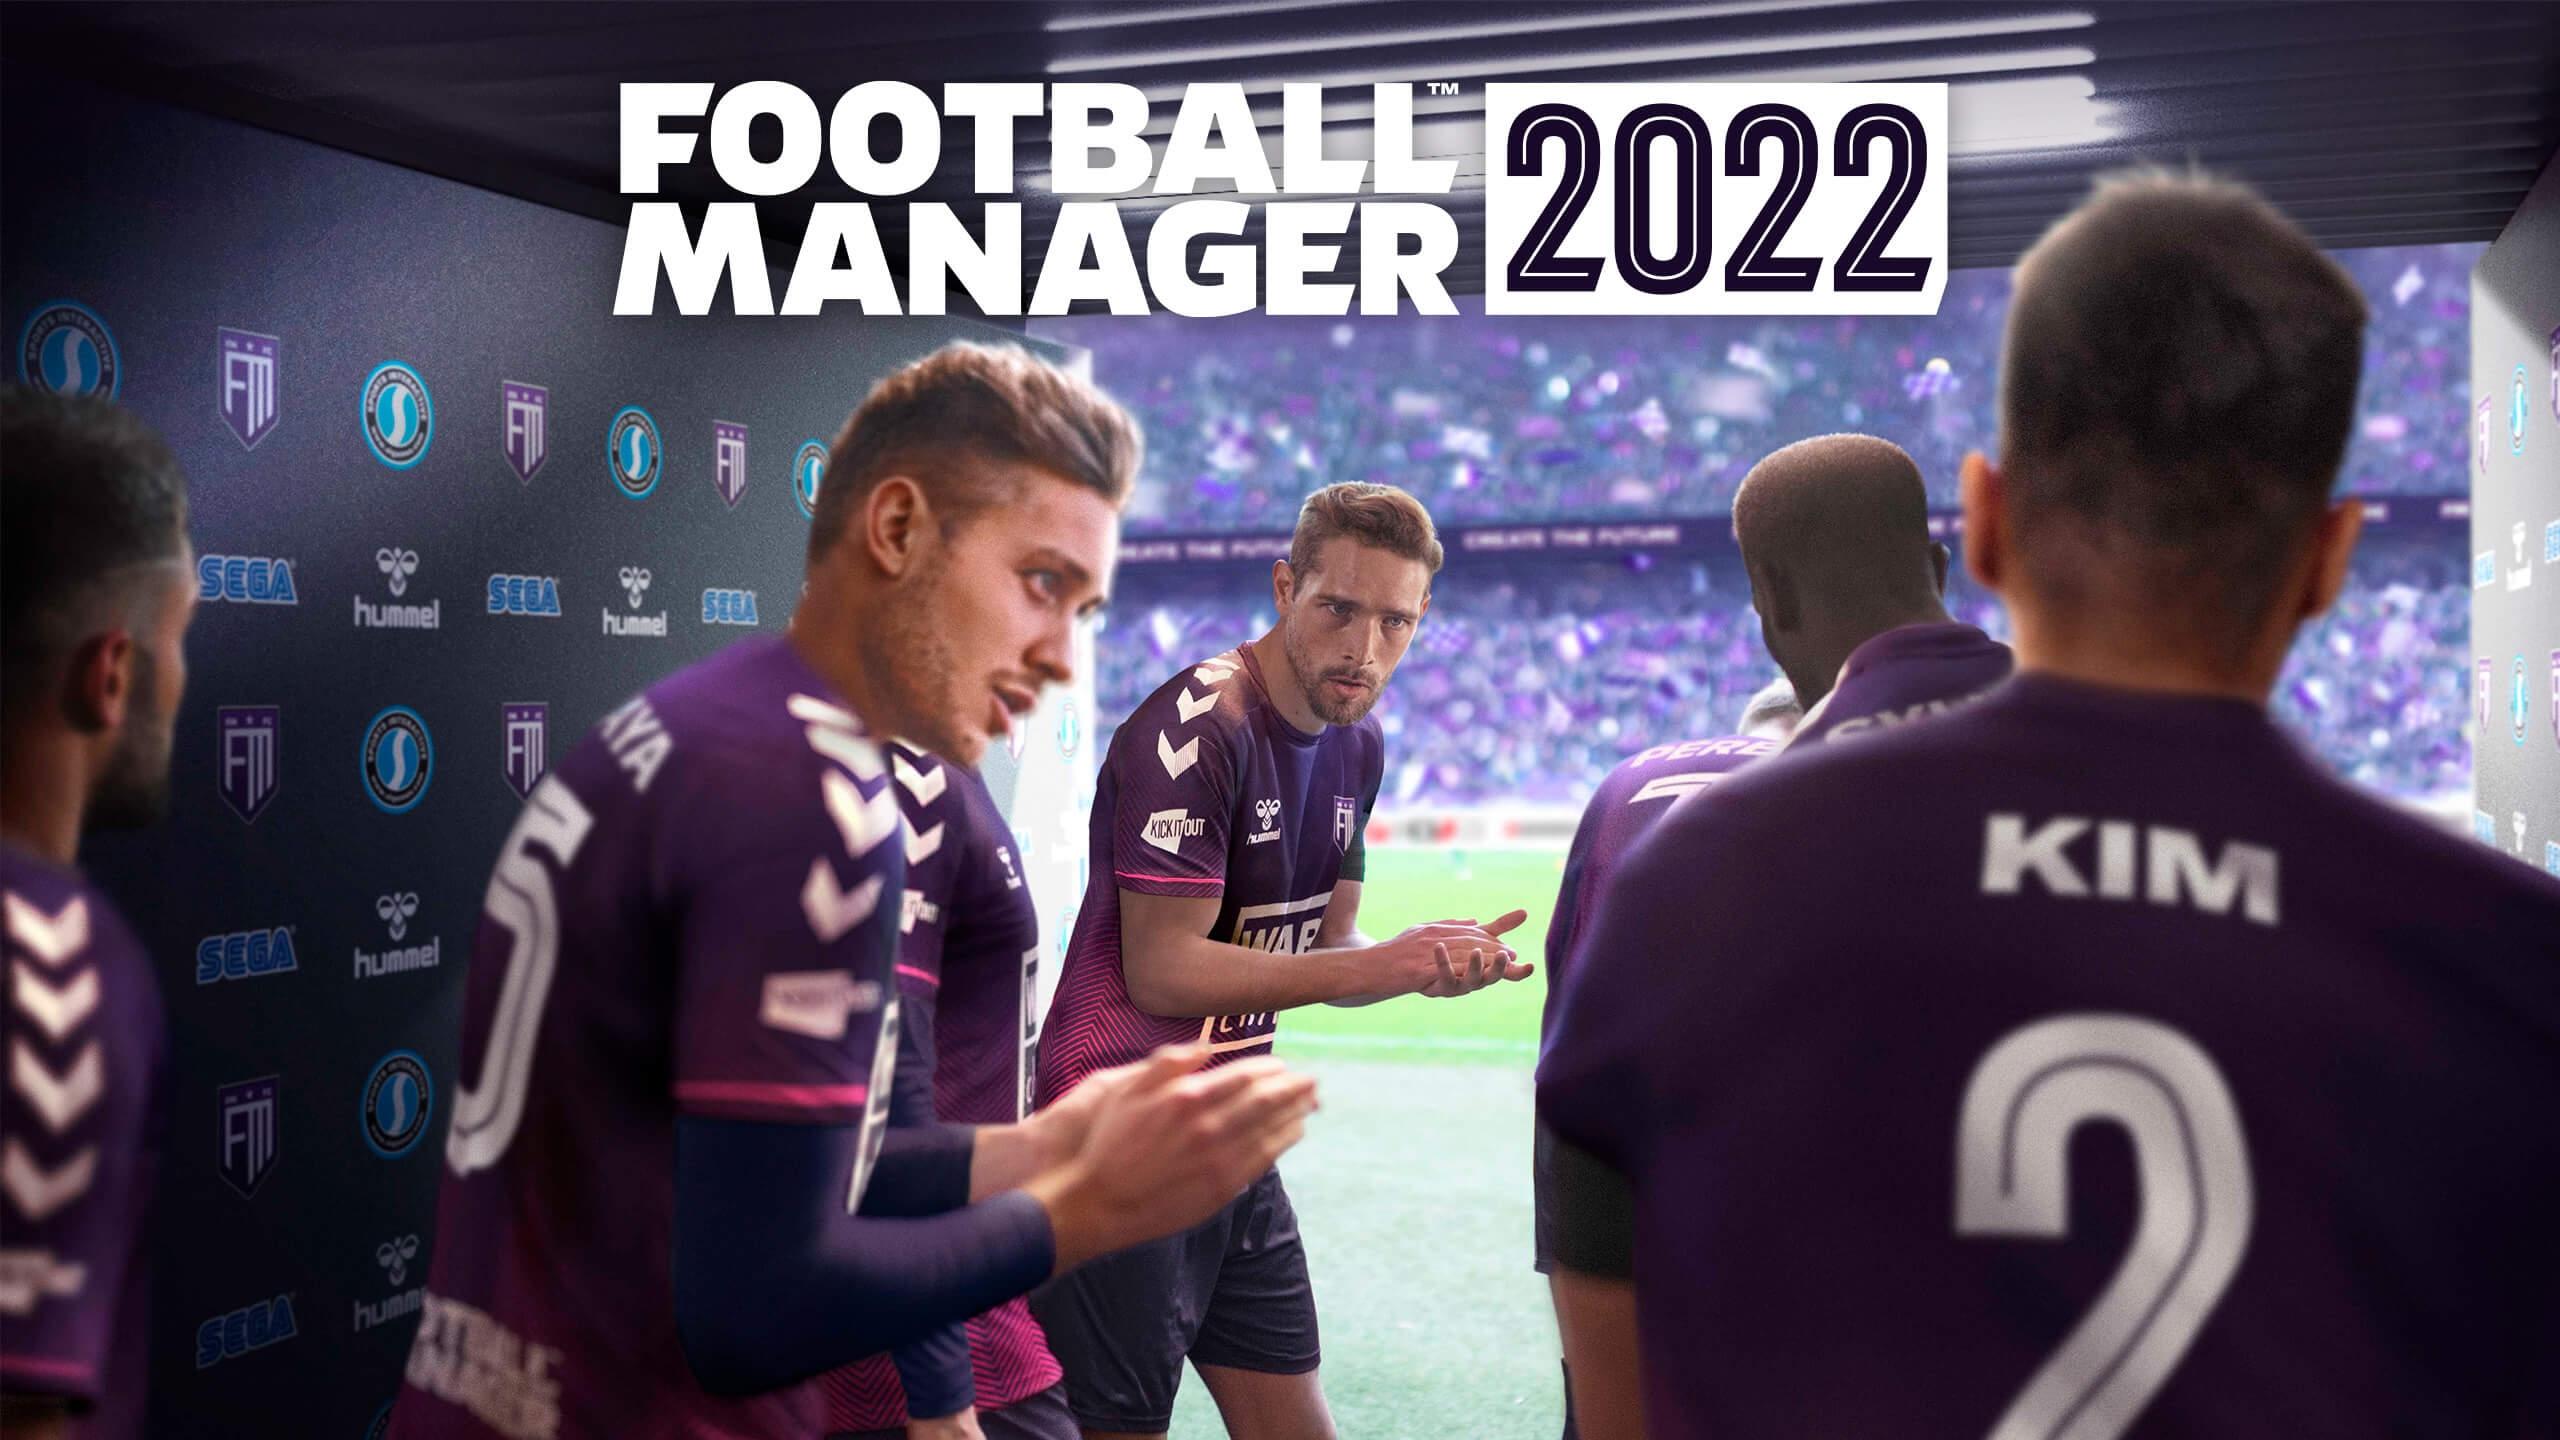 Oferta Football Manager 2022